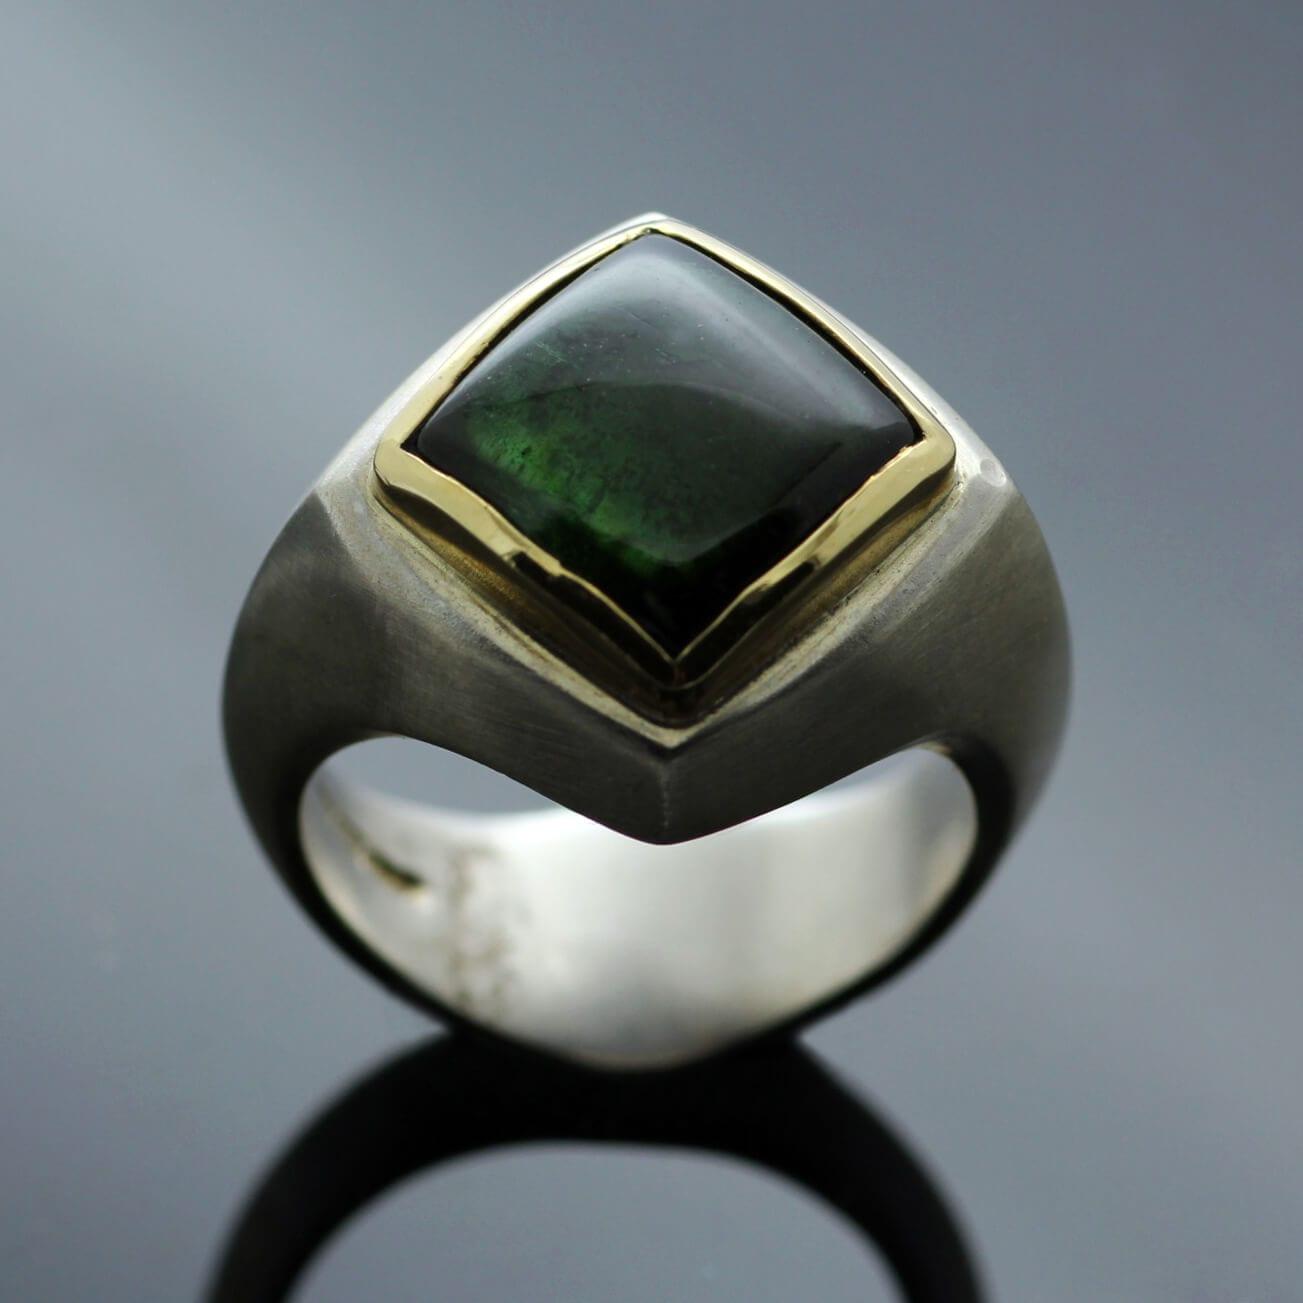 Tourmaline gemstone Abbey ring by Julian Stephens